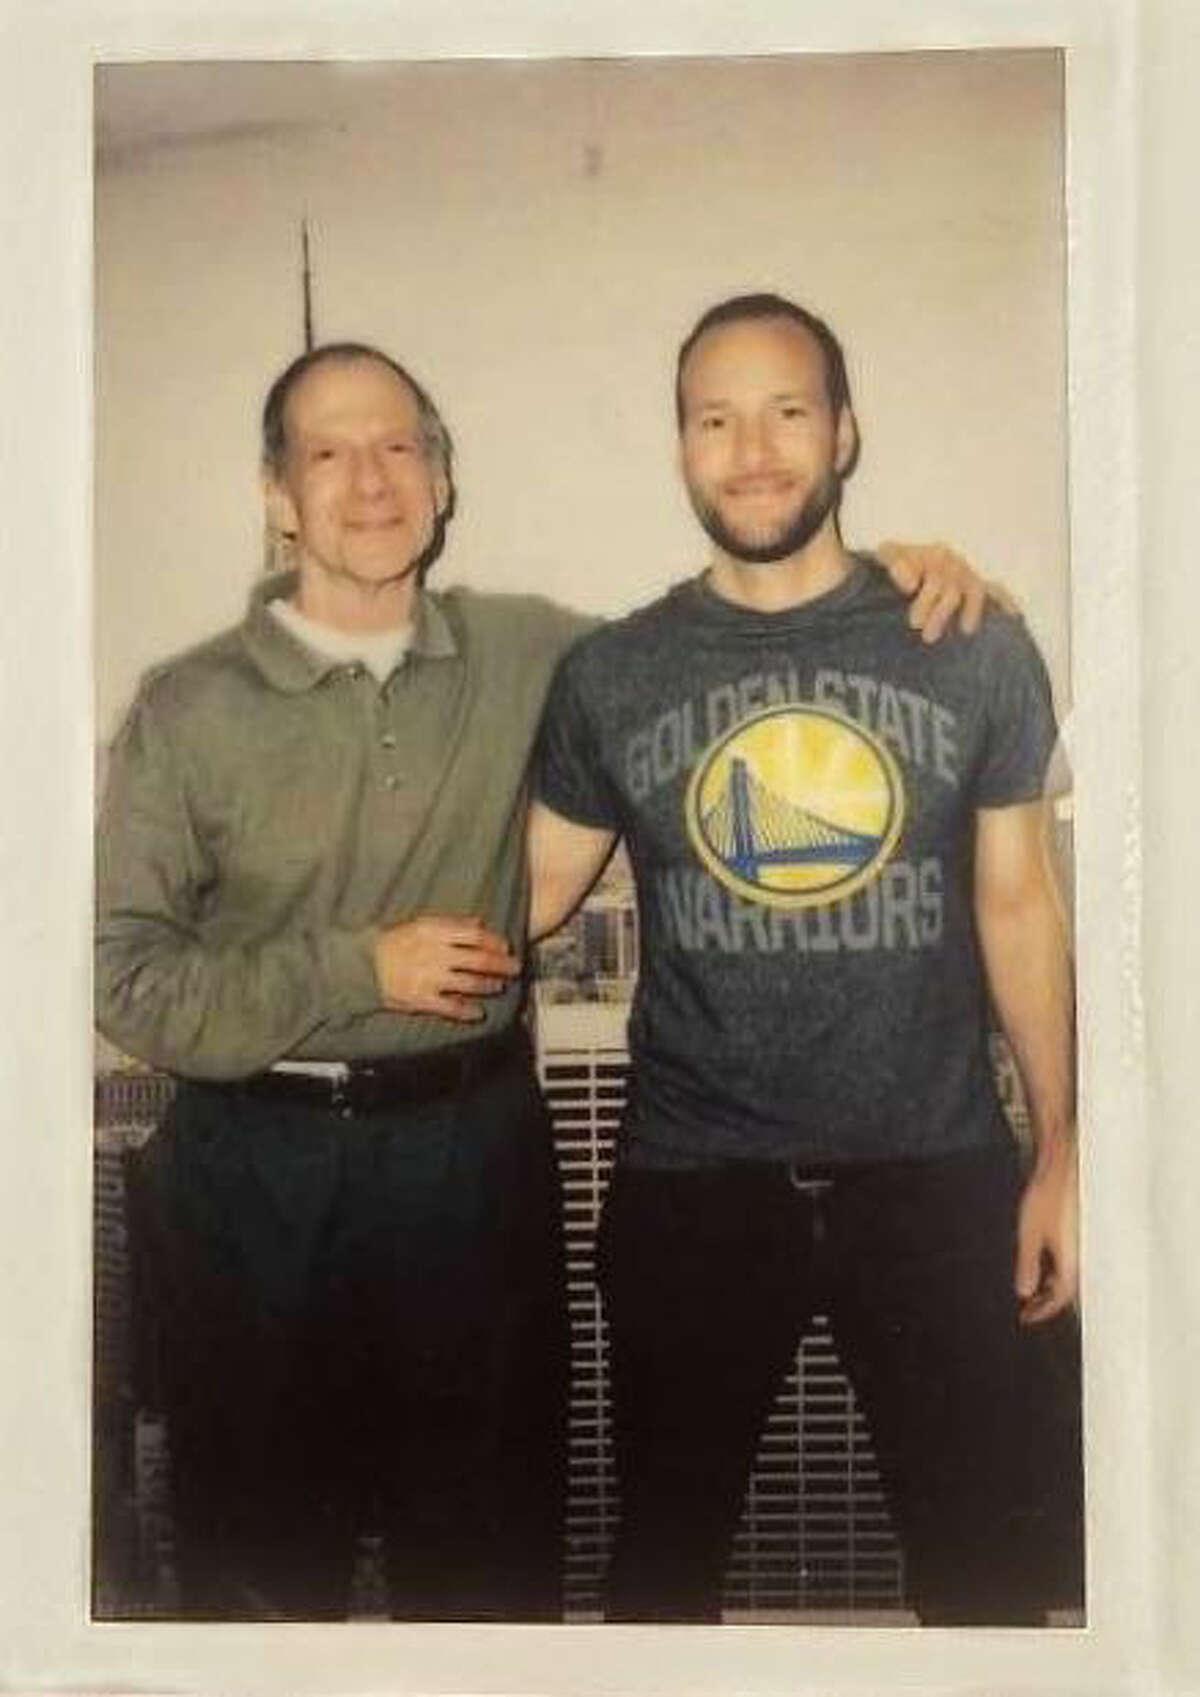 Chesa Boudin and his father, David Gilbert.